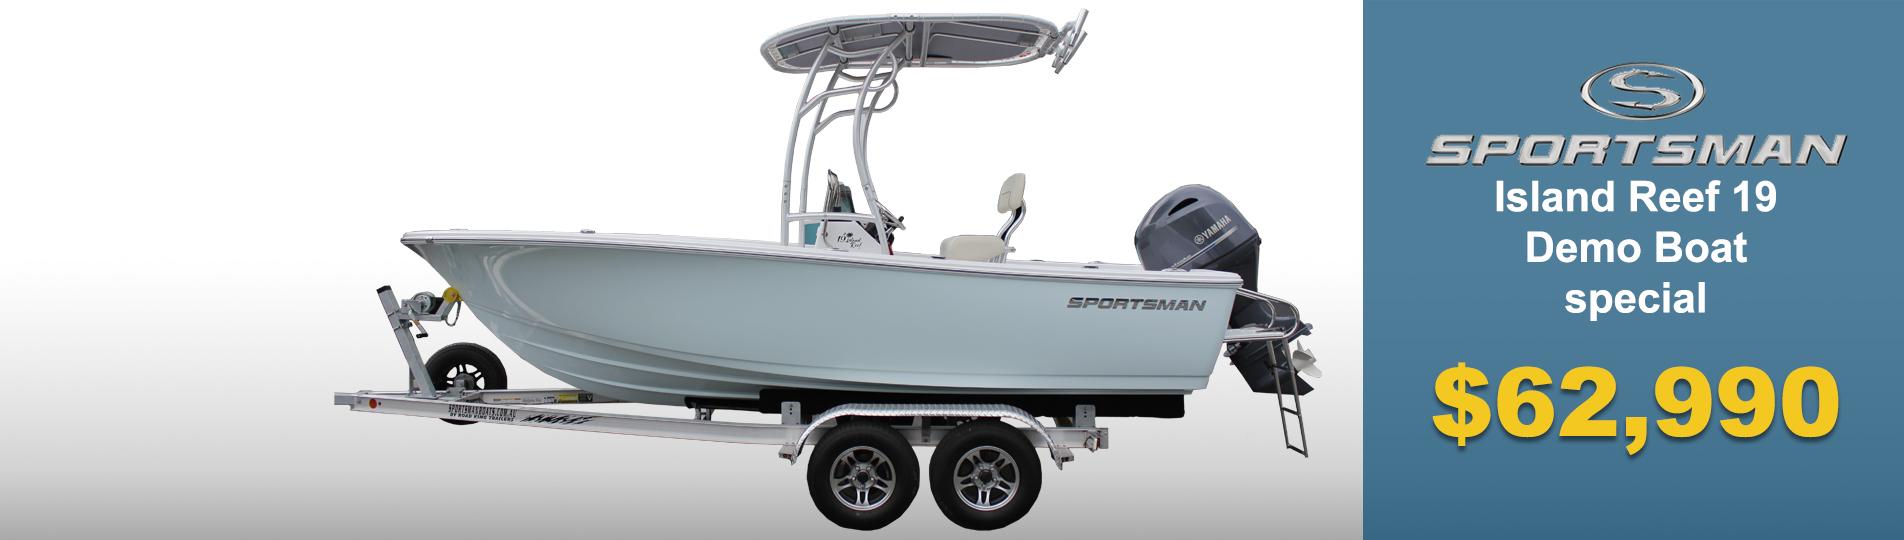 19_demo_boat-2